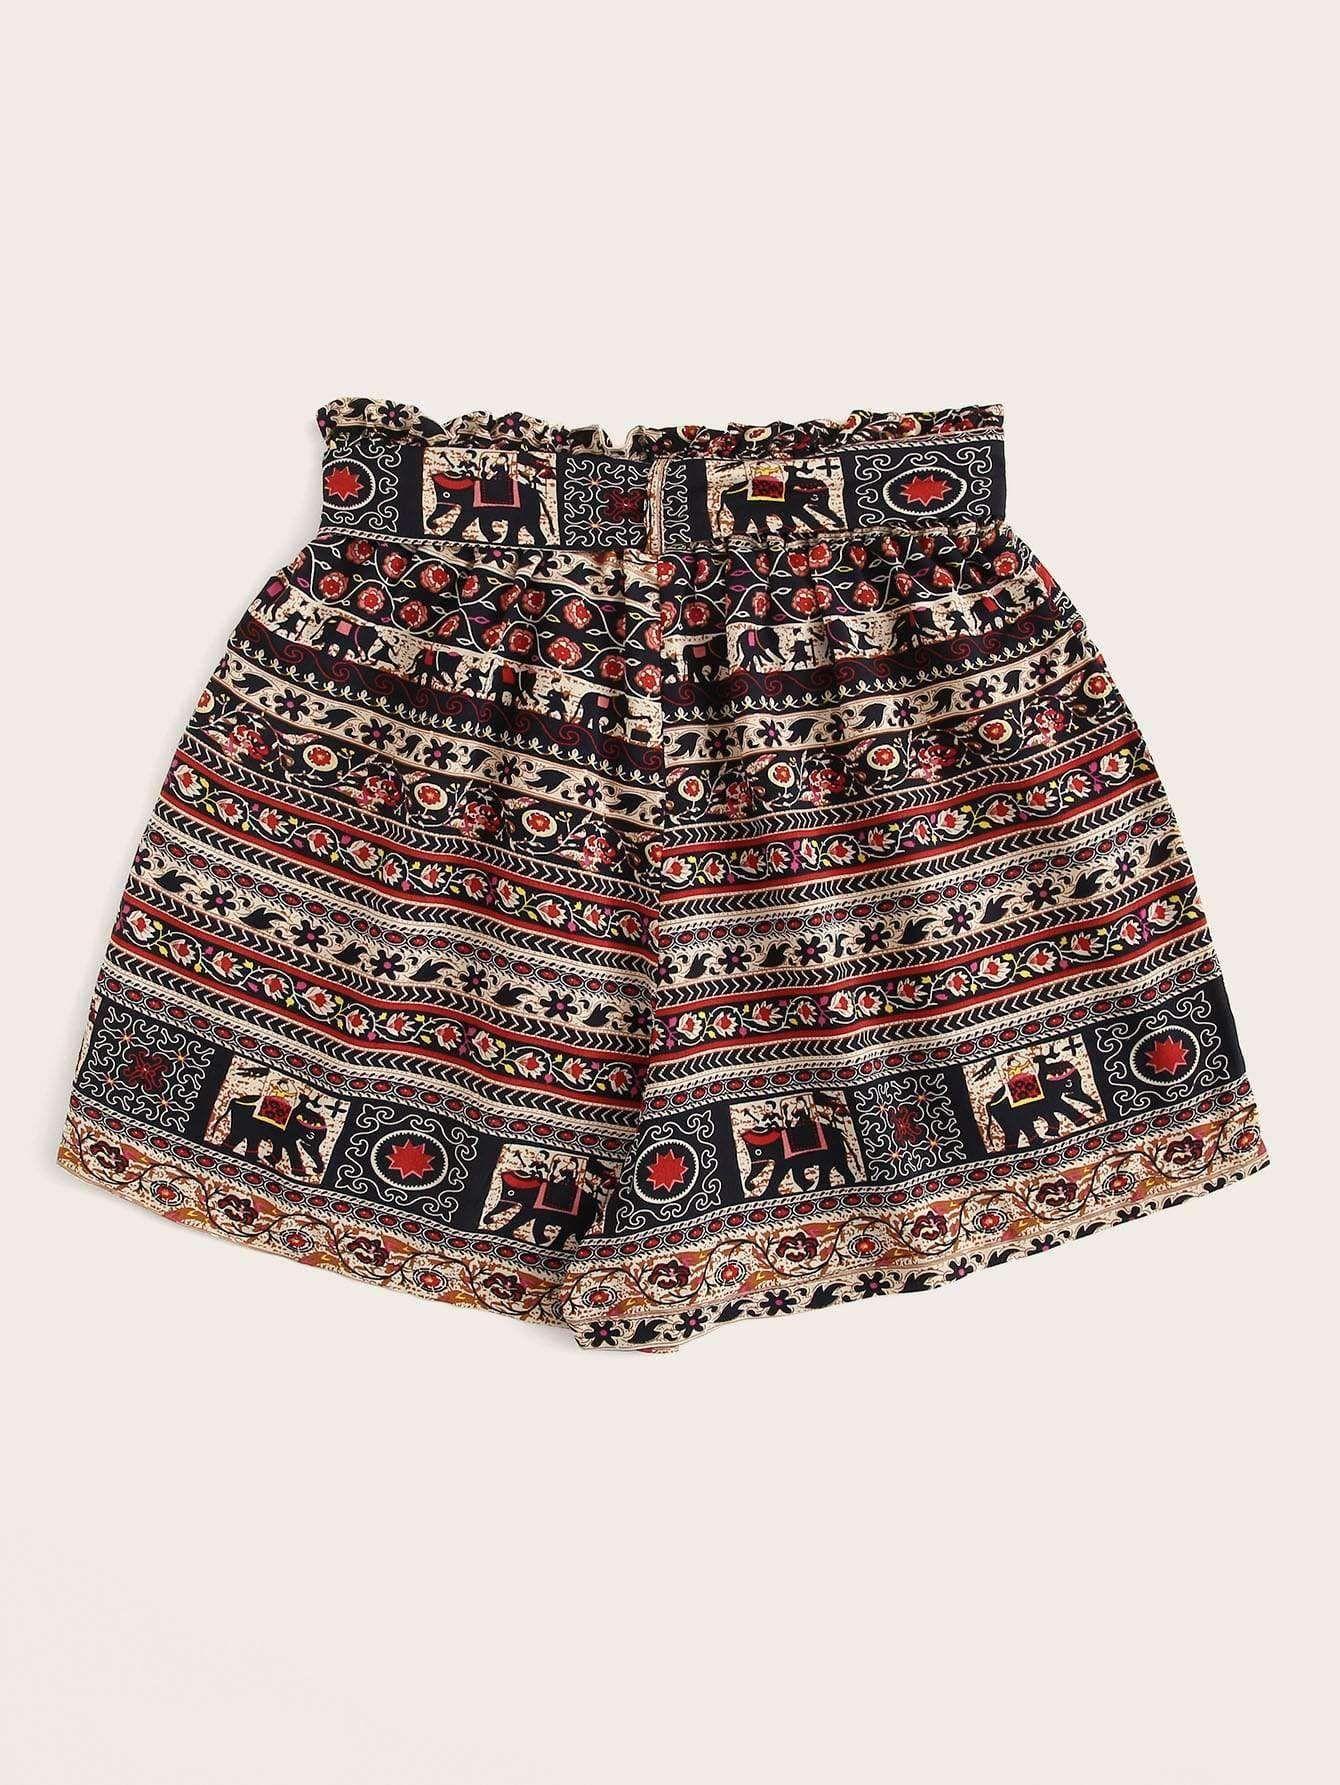 Fashionivo Aztec Print Self Tie Paperbag Shorts #aztec